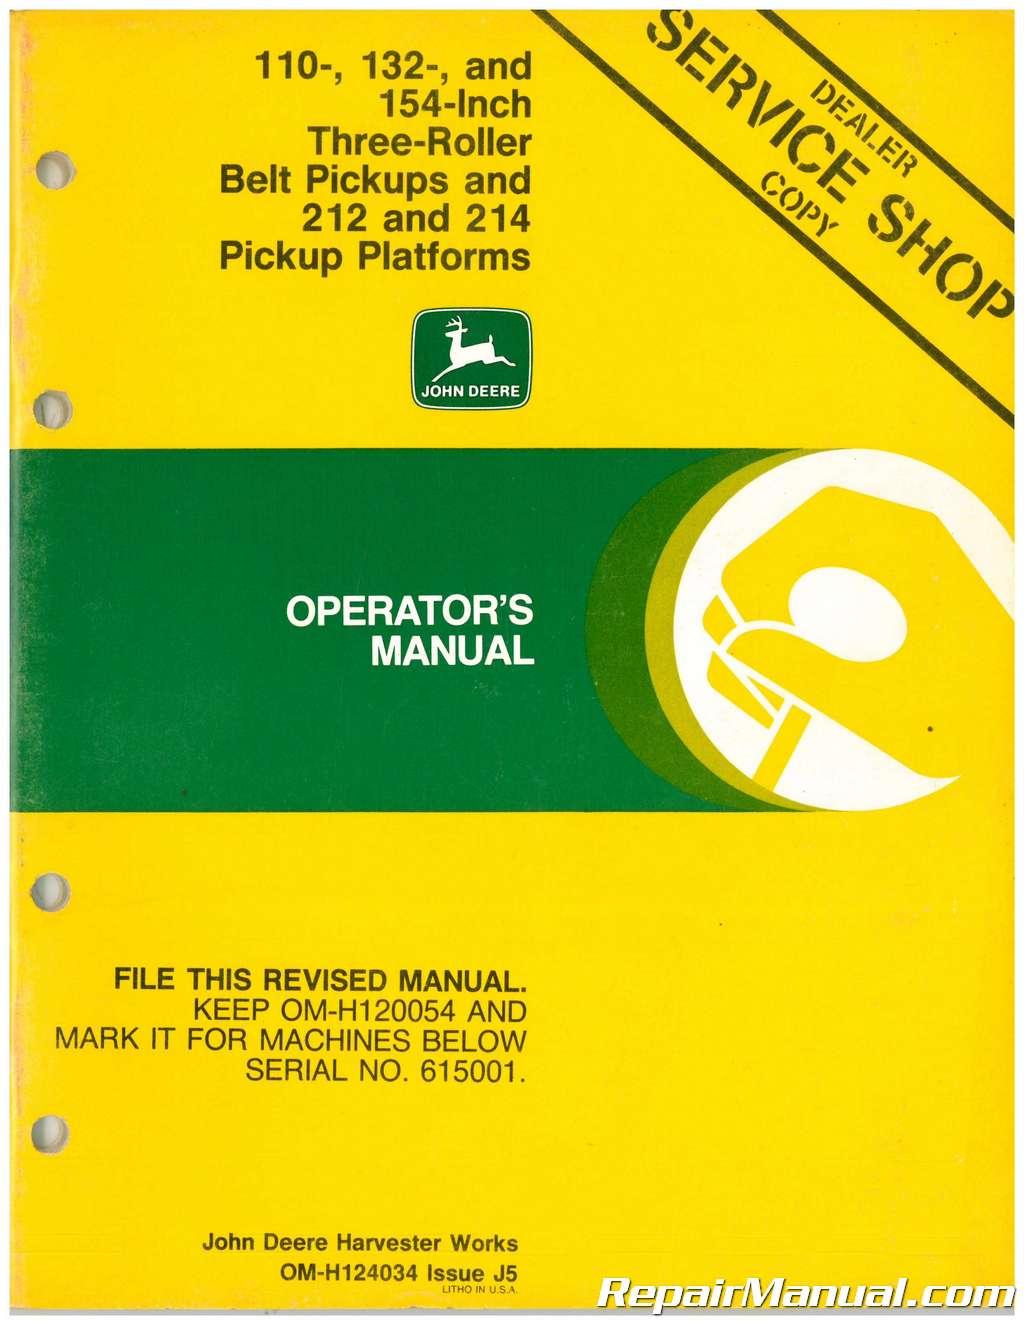 John Deere 110 Backhoe Owners Manual Best Deer Photos Water 214 Mower Deck Belt Diagram Car Interior Design 132 And 154 In Three Roller Pickups 212